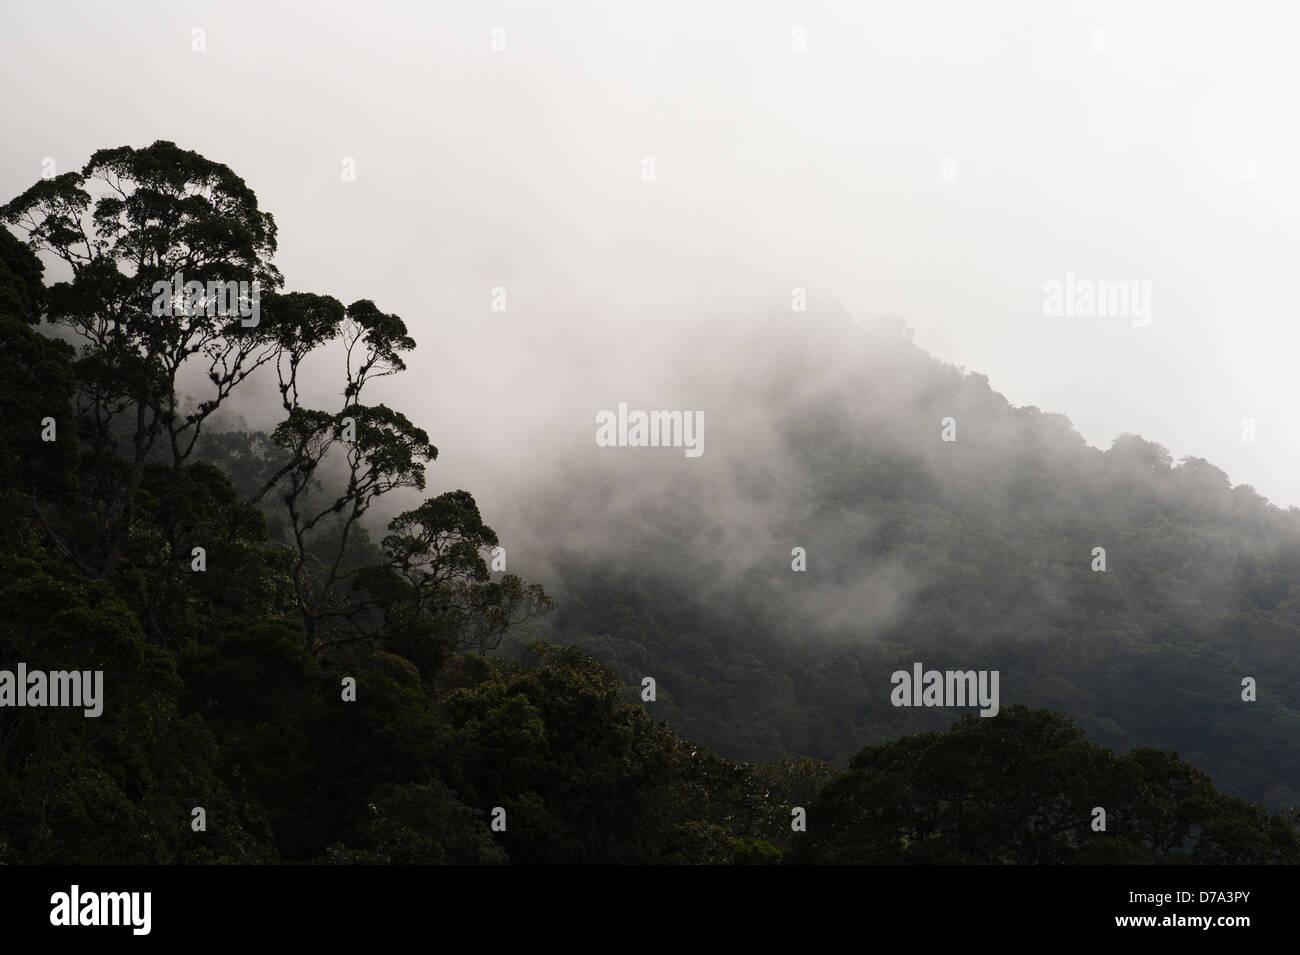 Colombia - misty rain forest in Sierra Nevada de Santa Marta Immagini Stock